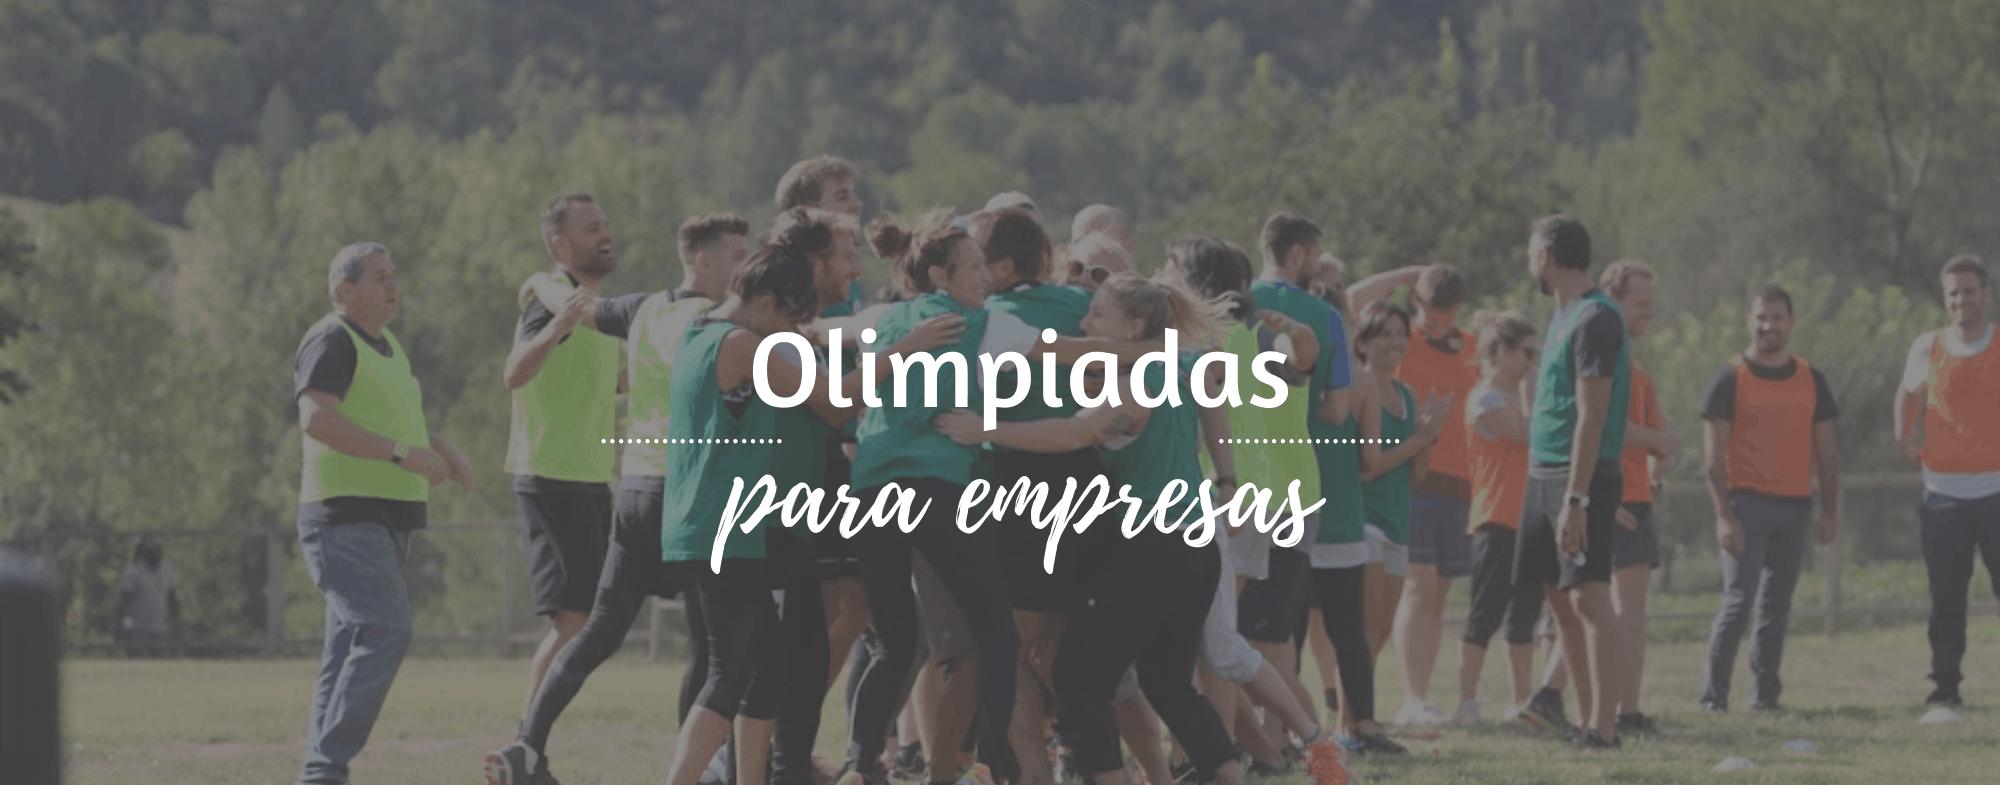 olimpiadas-para-empresas